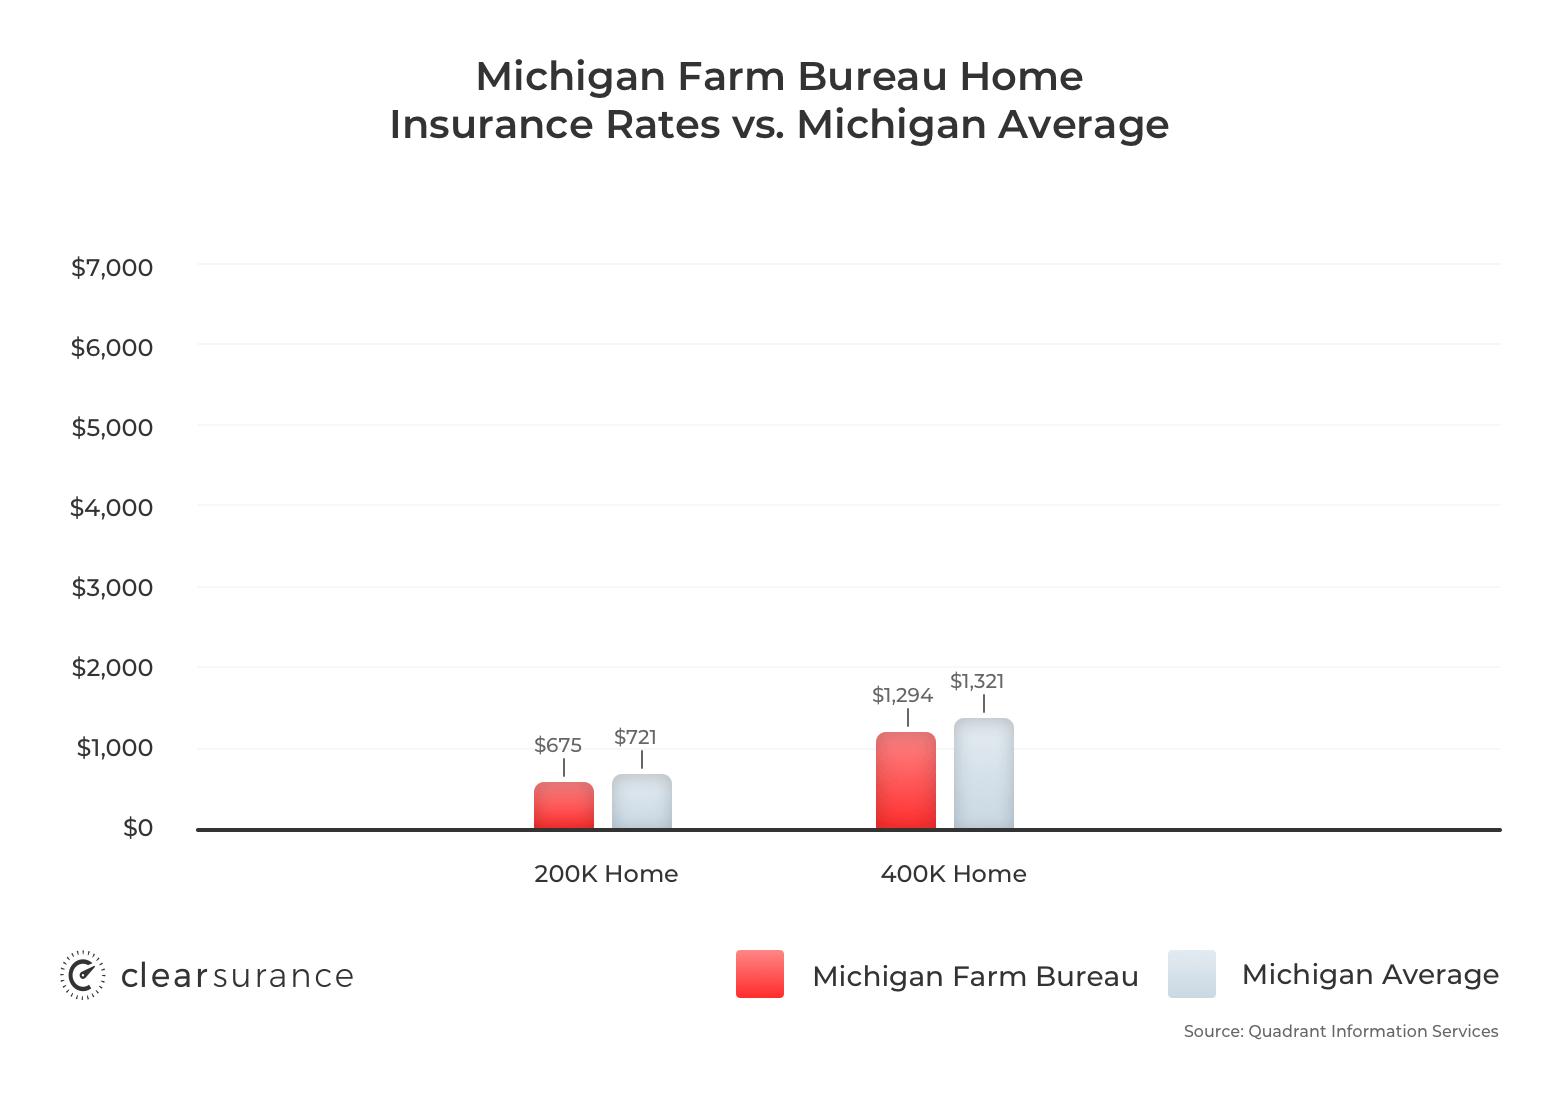 Michigan Farm Bureau homeowners insurance rates